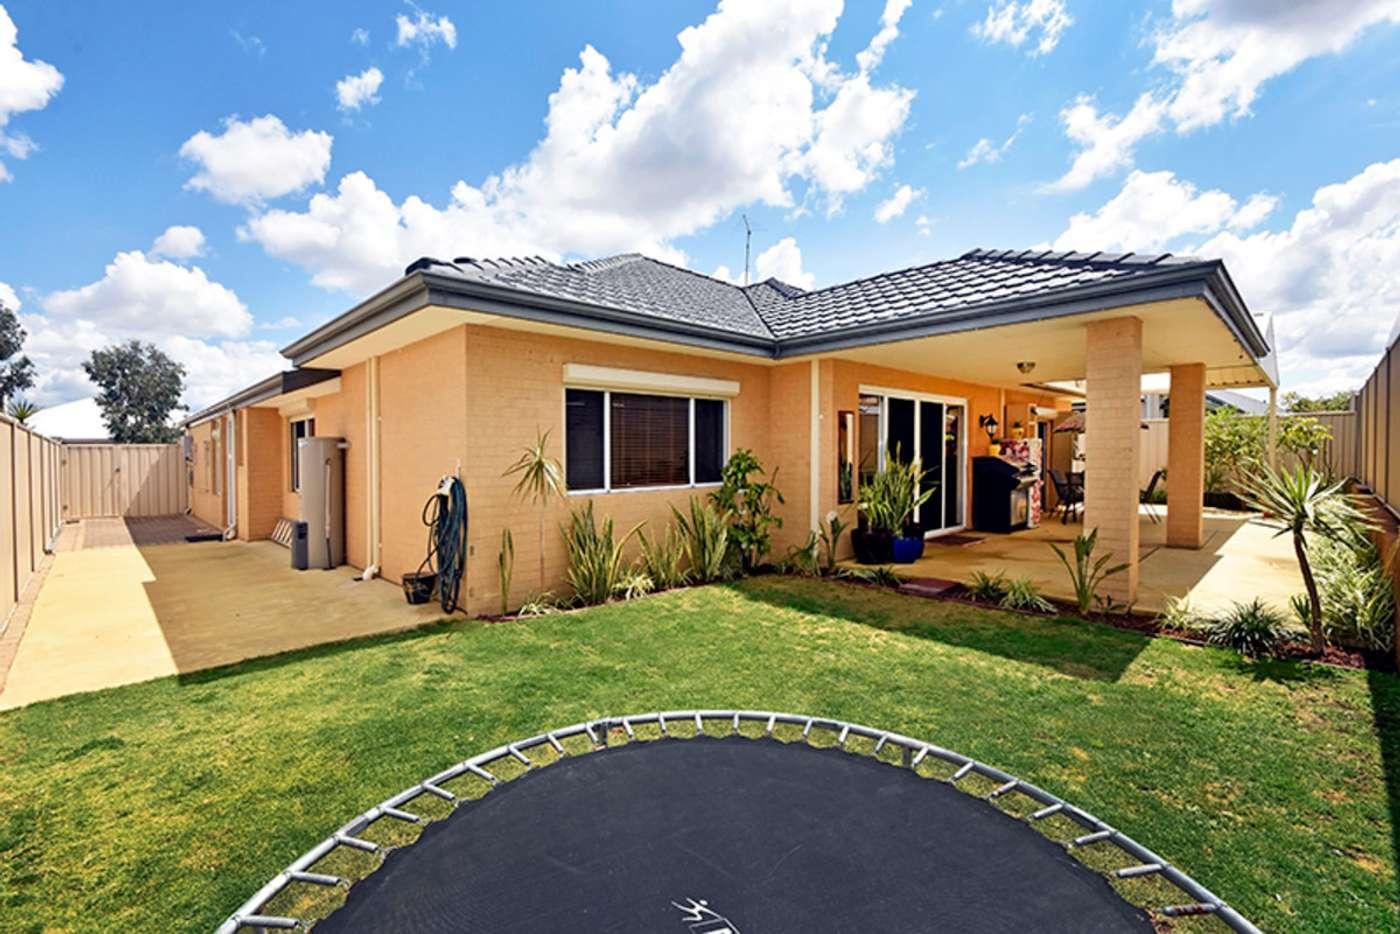 Main view of Homely house listing, 12 Colorino Avenue, Caversham WA 6055